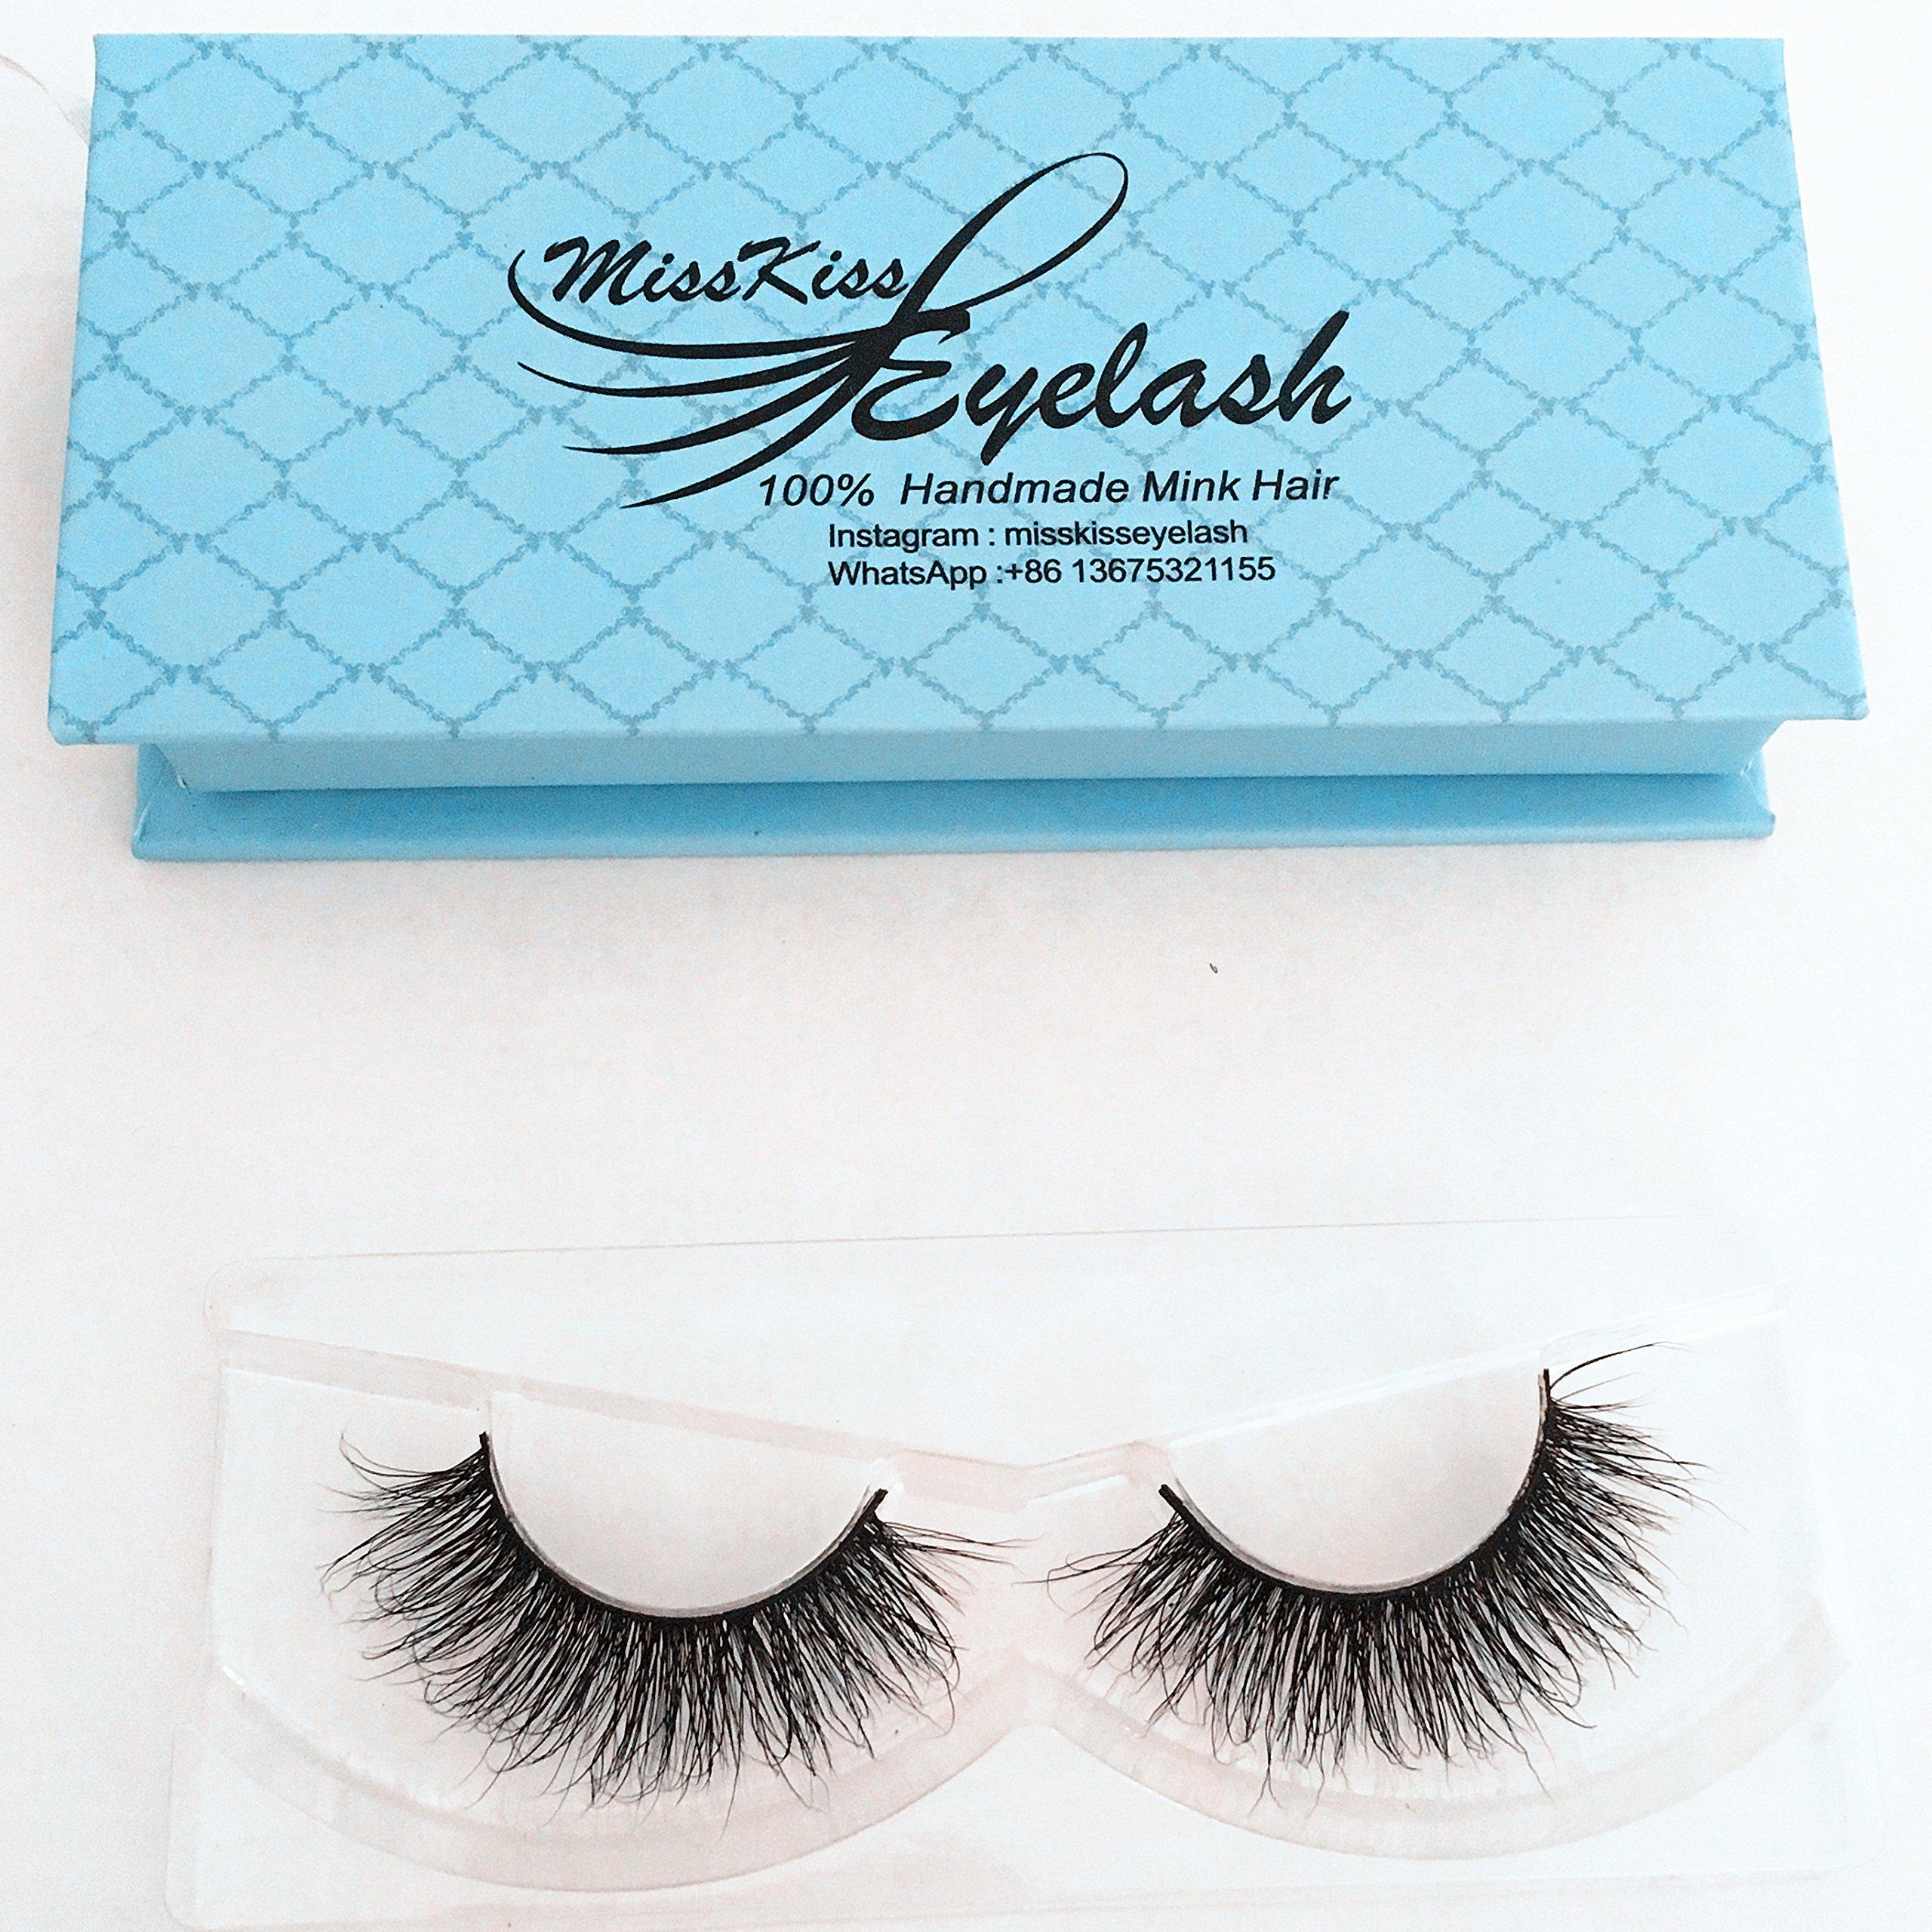 1bbb6badc9c Get Quotations · Mink 3D Lashes Dramatic Makeup High Quality Strip Eyelashes  100% Siberian Fur Fake Eyelashes Hand